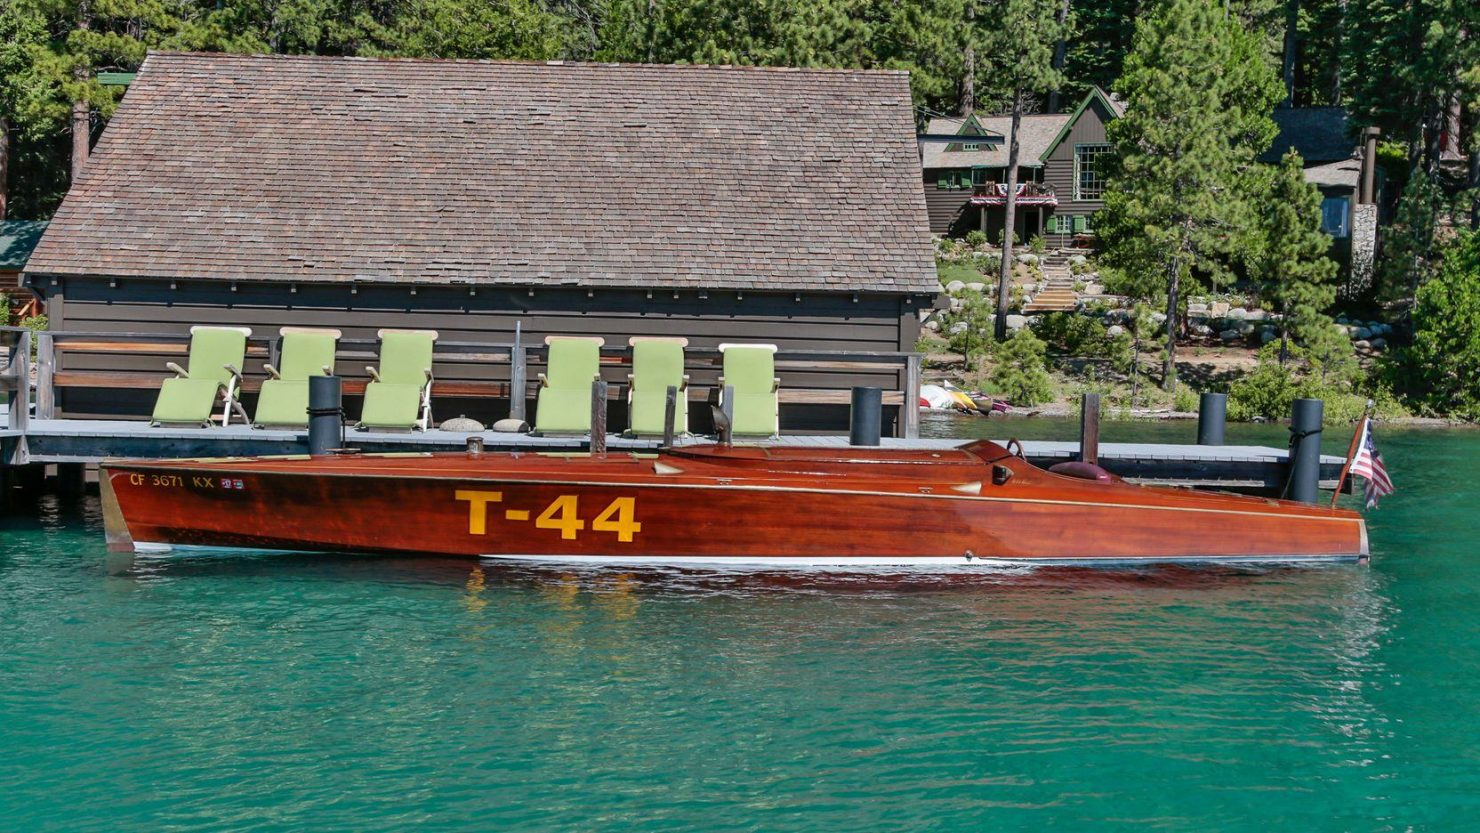 mahogany speed boat 5 1480x833 - 27 Liter V12 Brown & Bassett Gentleman's Racer